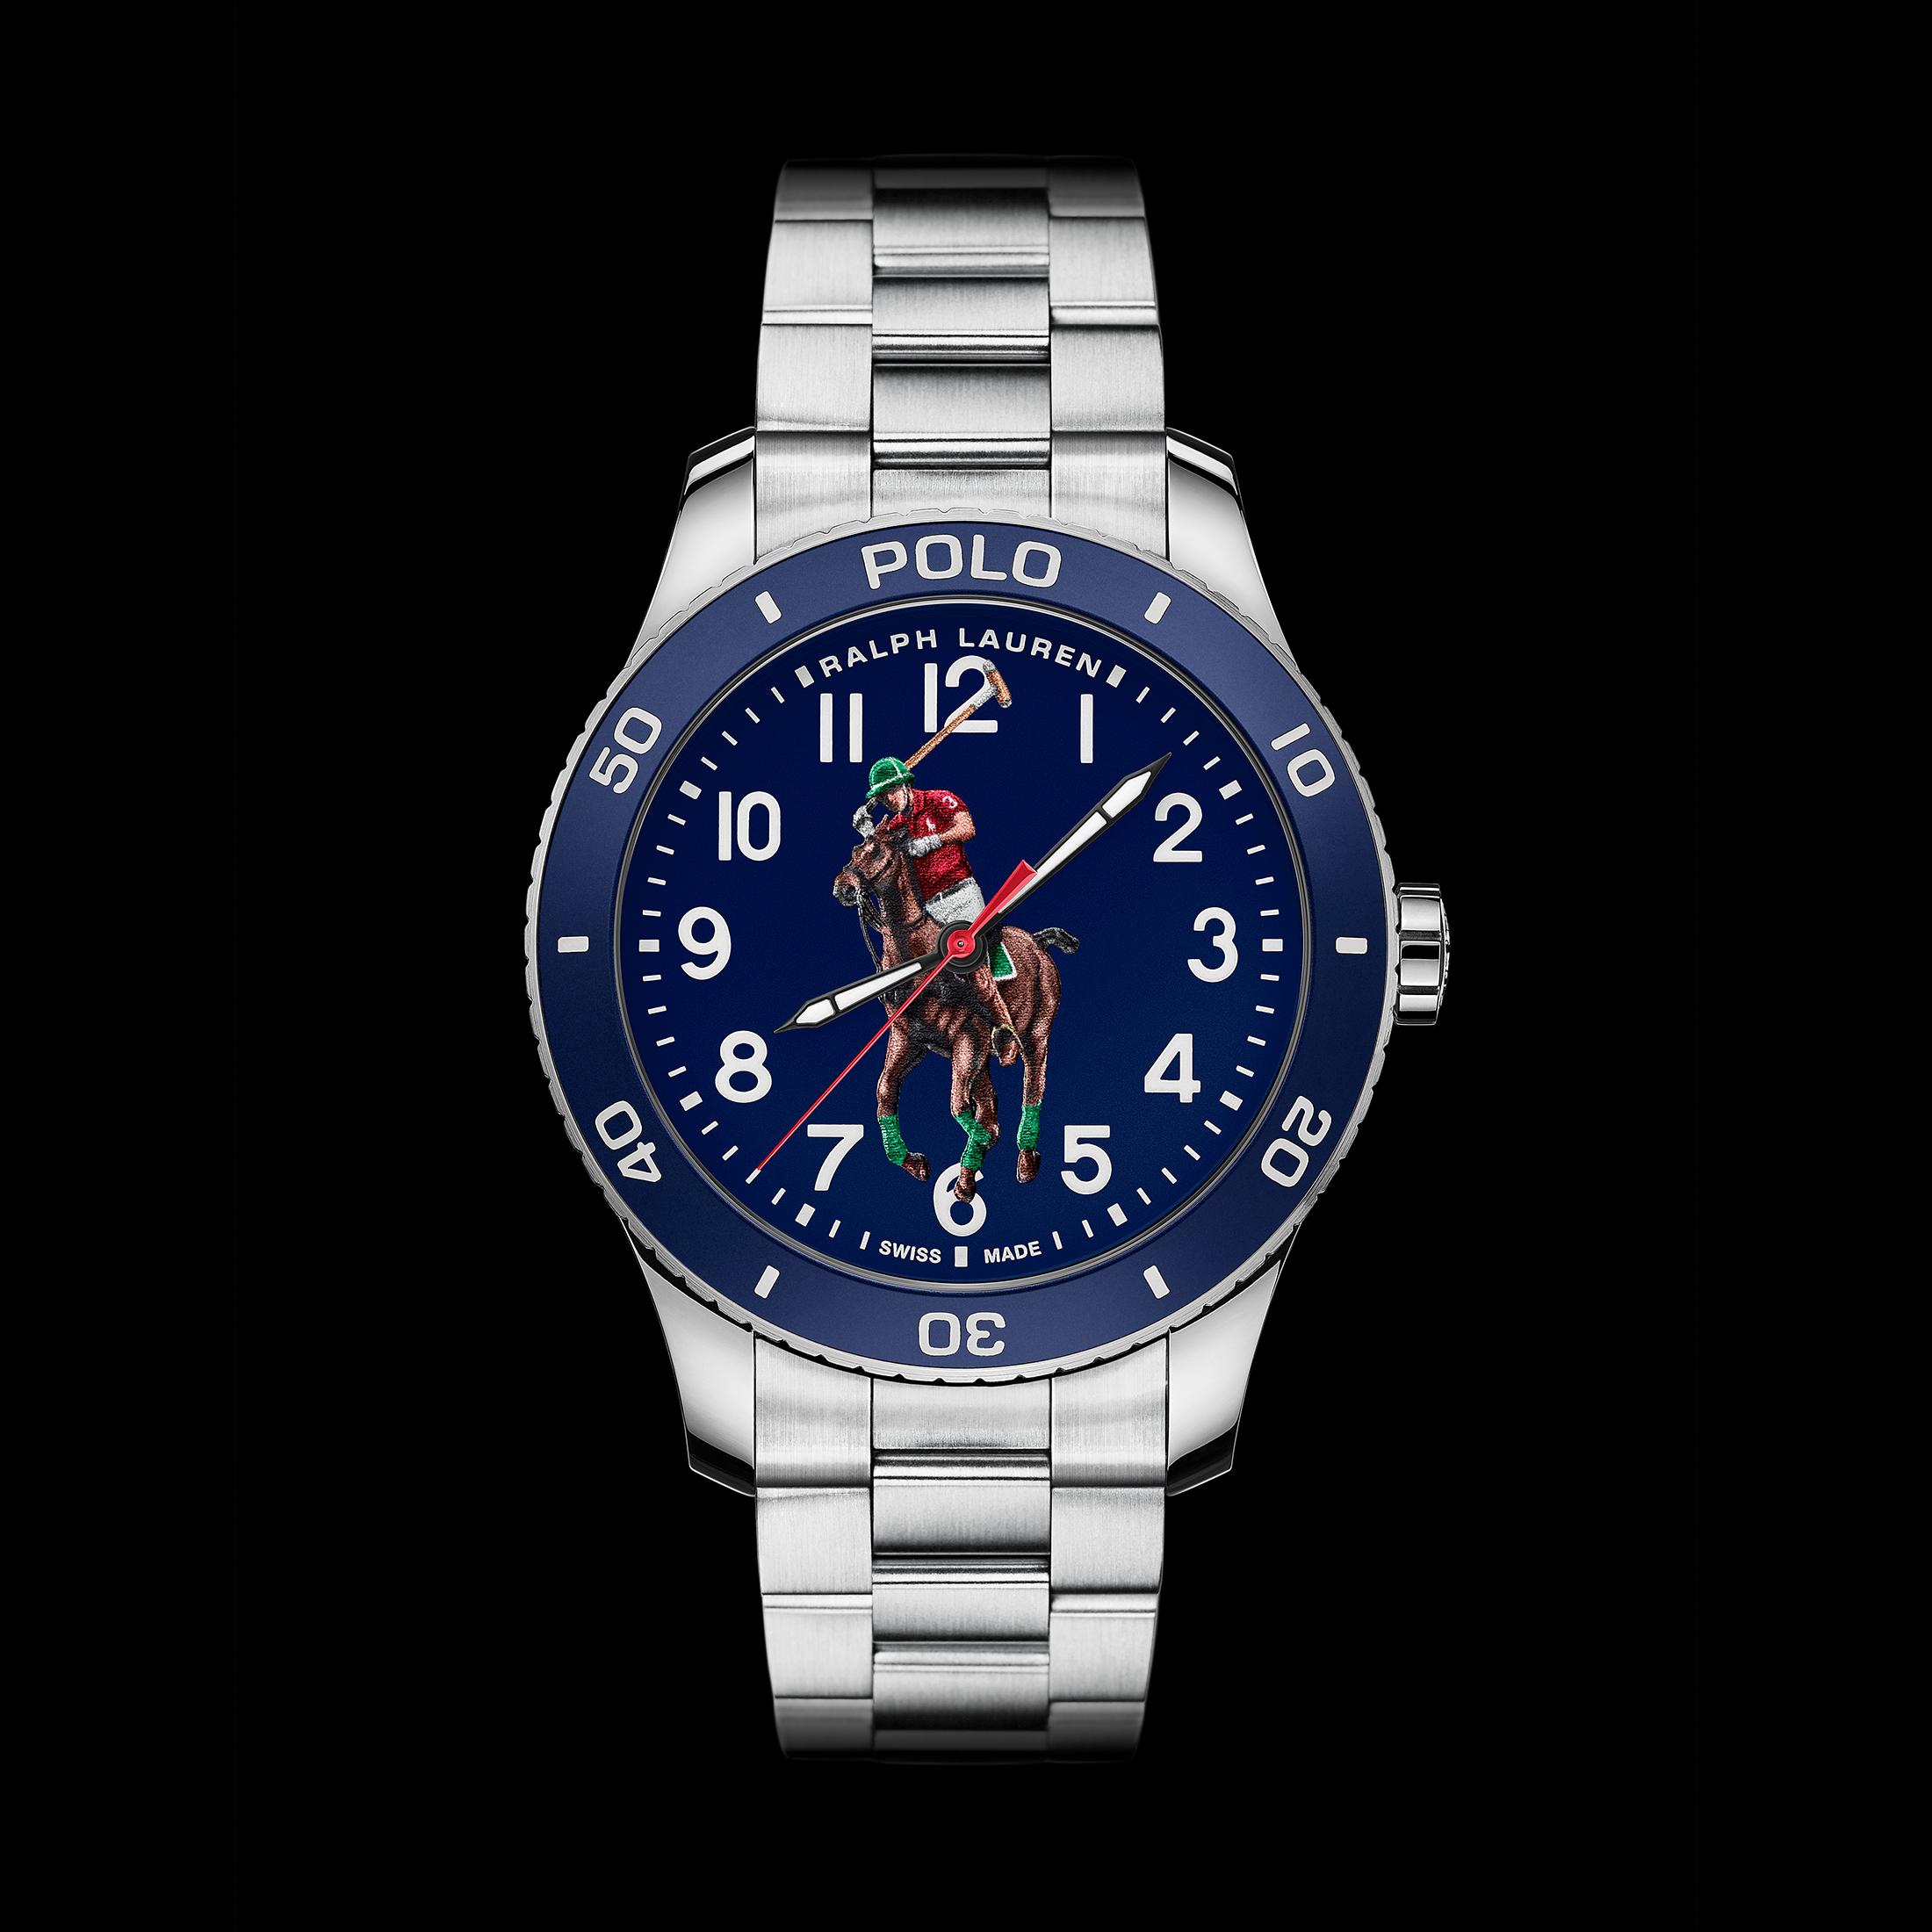 https://hodinkee.imgix.net/uploads/images/1600215817489-jajr8ew5ce-1f44d8896647855cae3c4a15711297f3/blue_steel_soldier.jpg